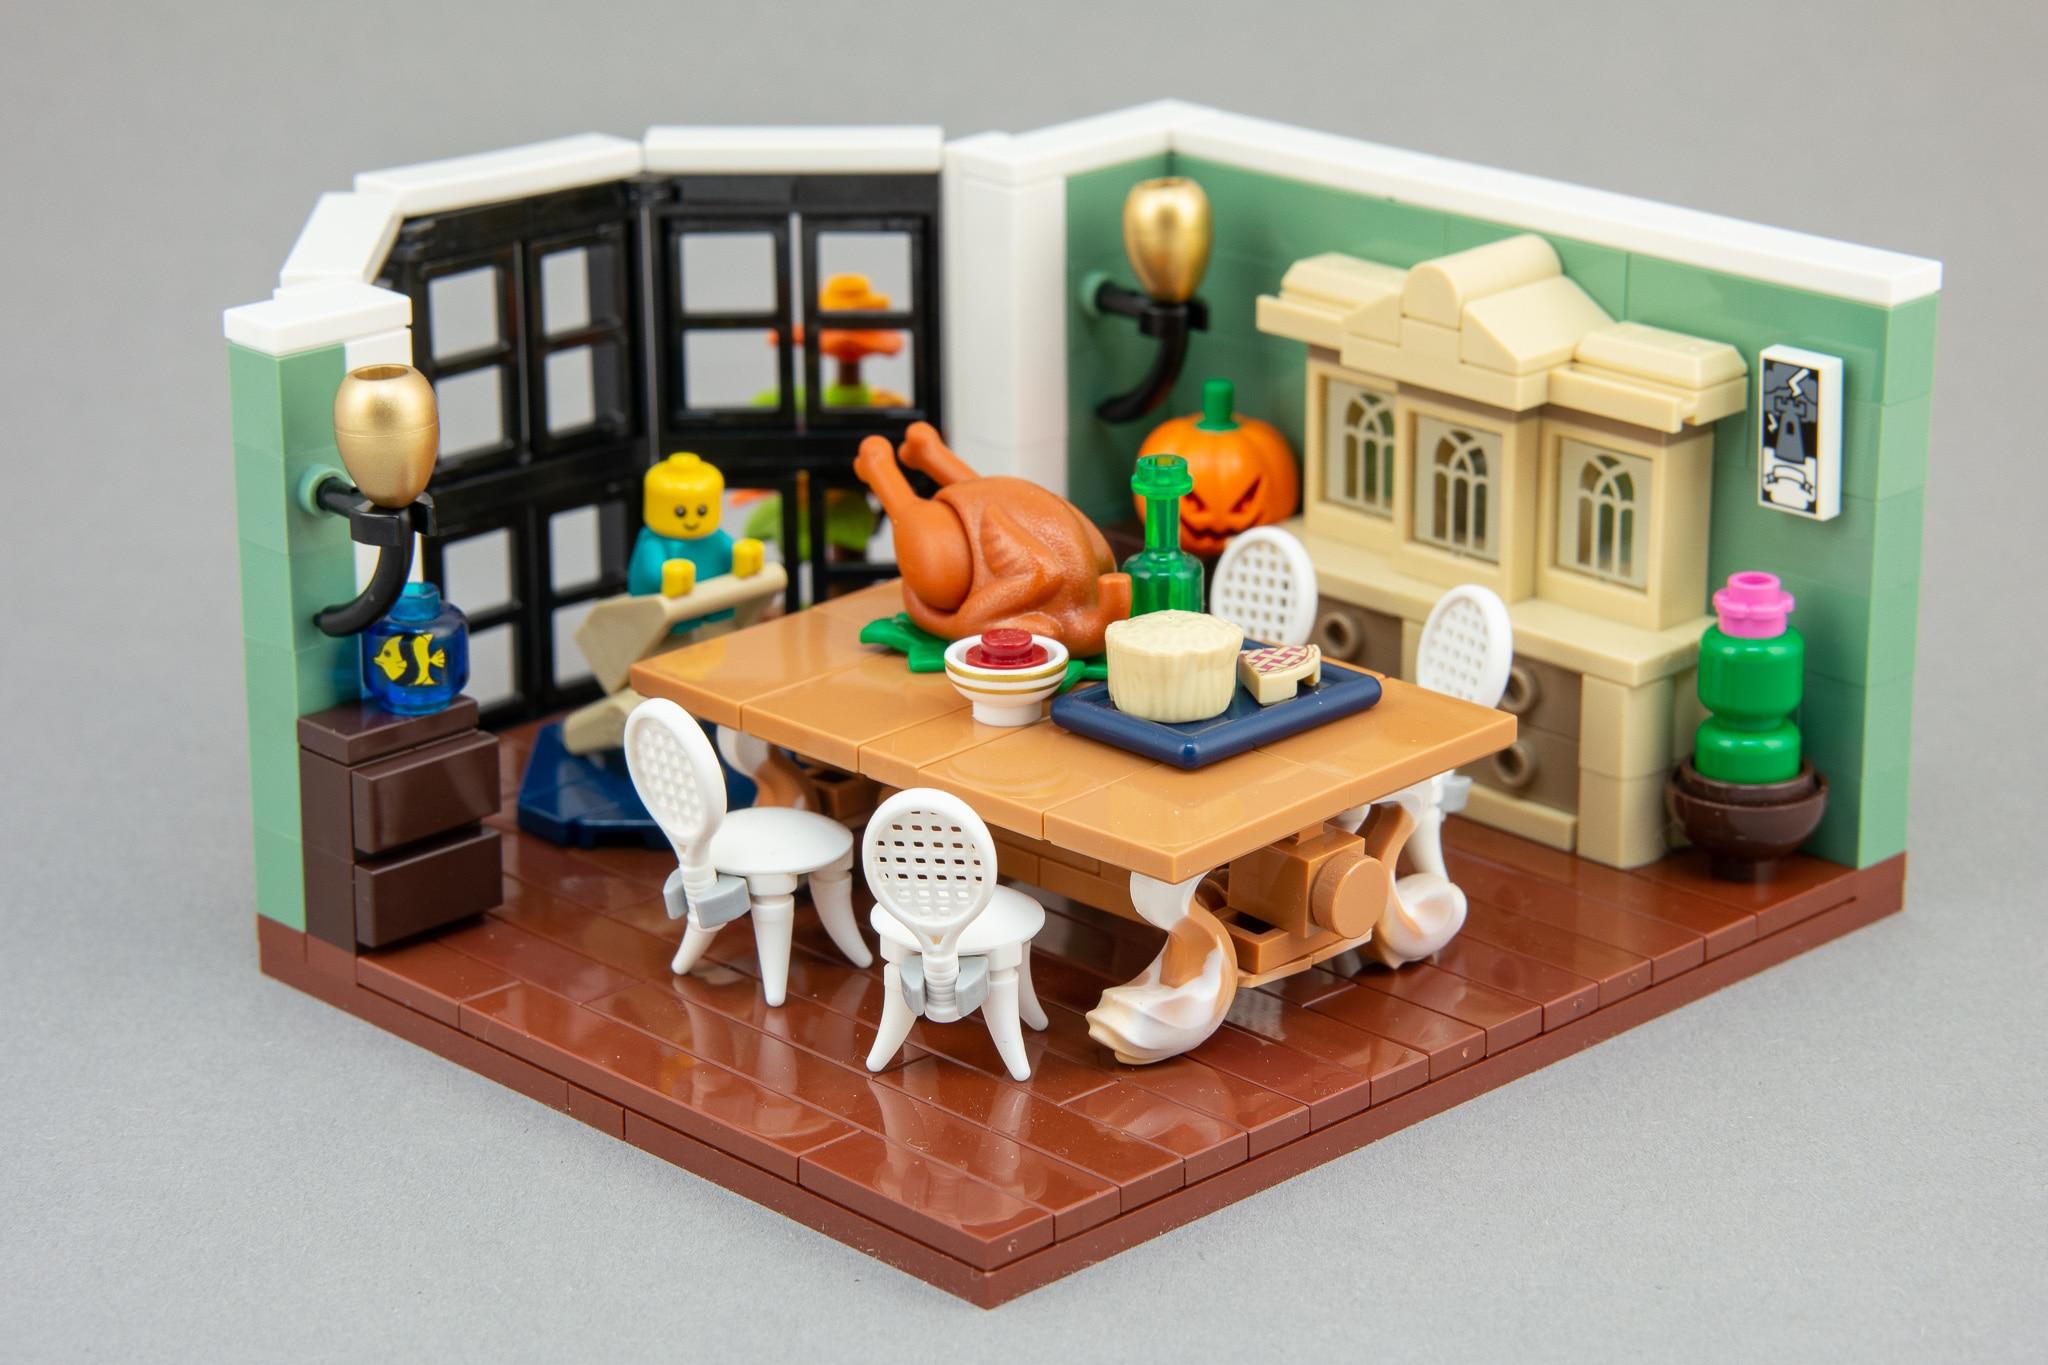 LEGO Moc Bausinpiration Esszimmer (6)